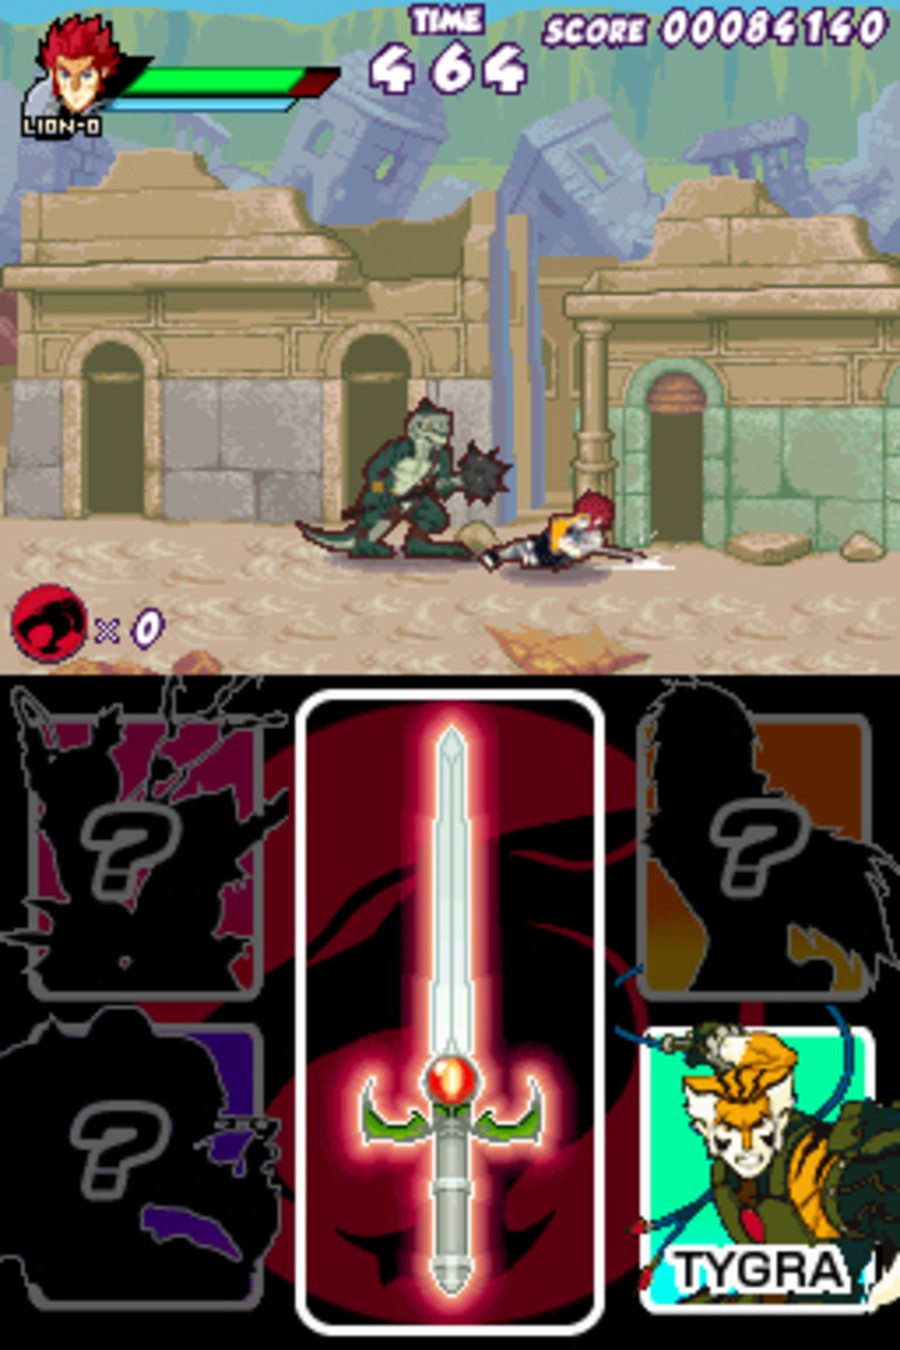 Thundercats Screenshot